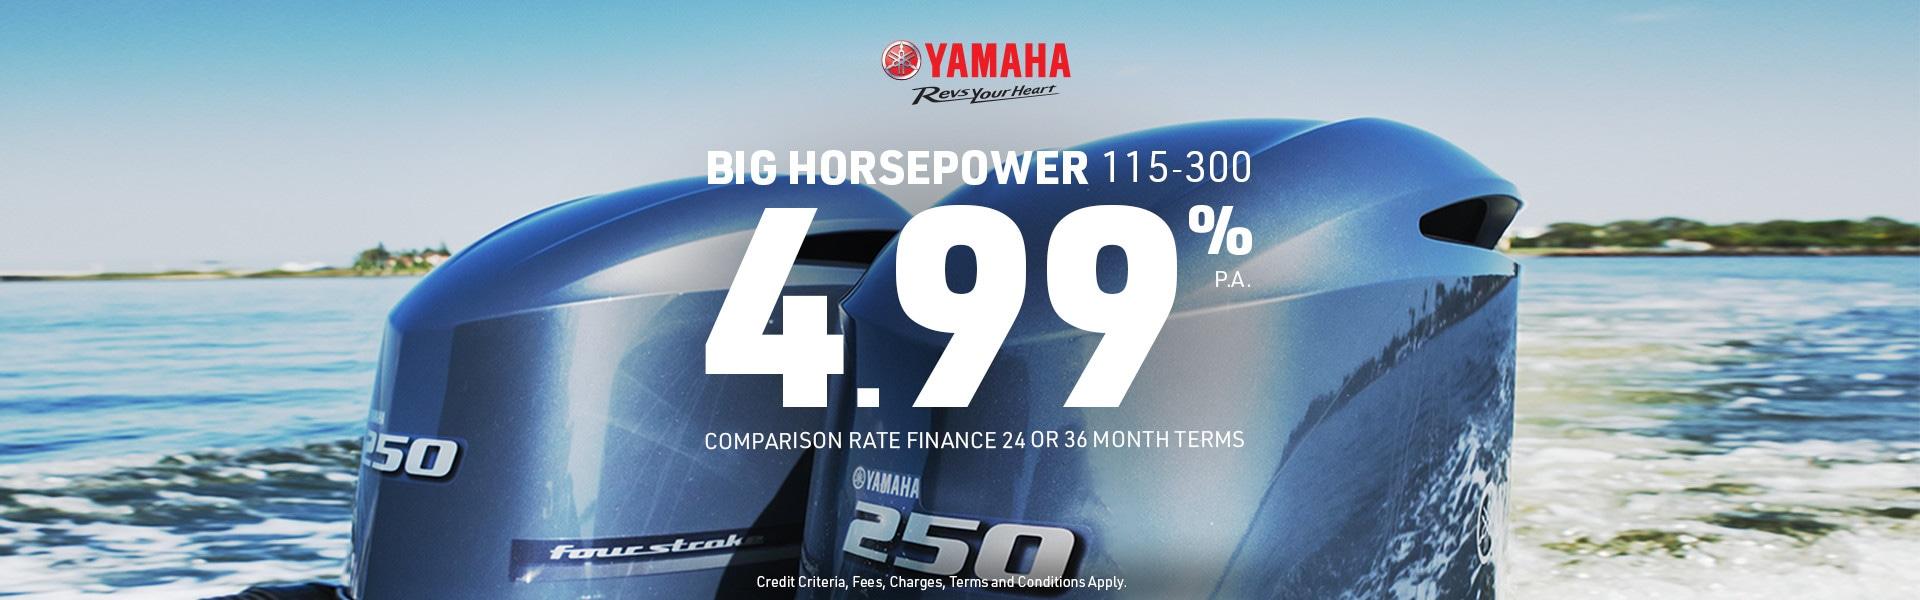 499-115-300HP-dealer-banner